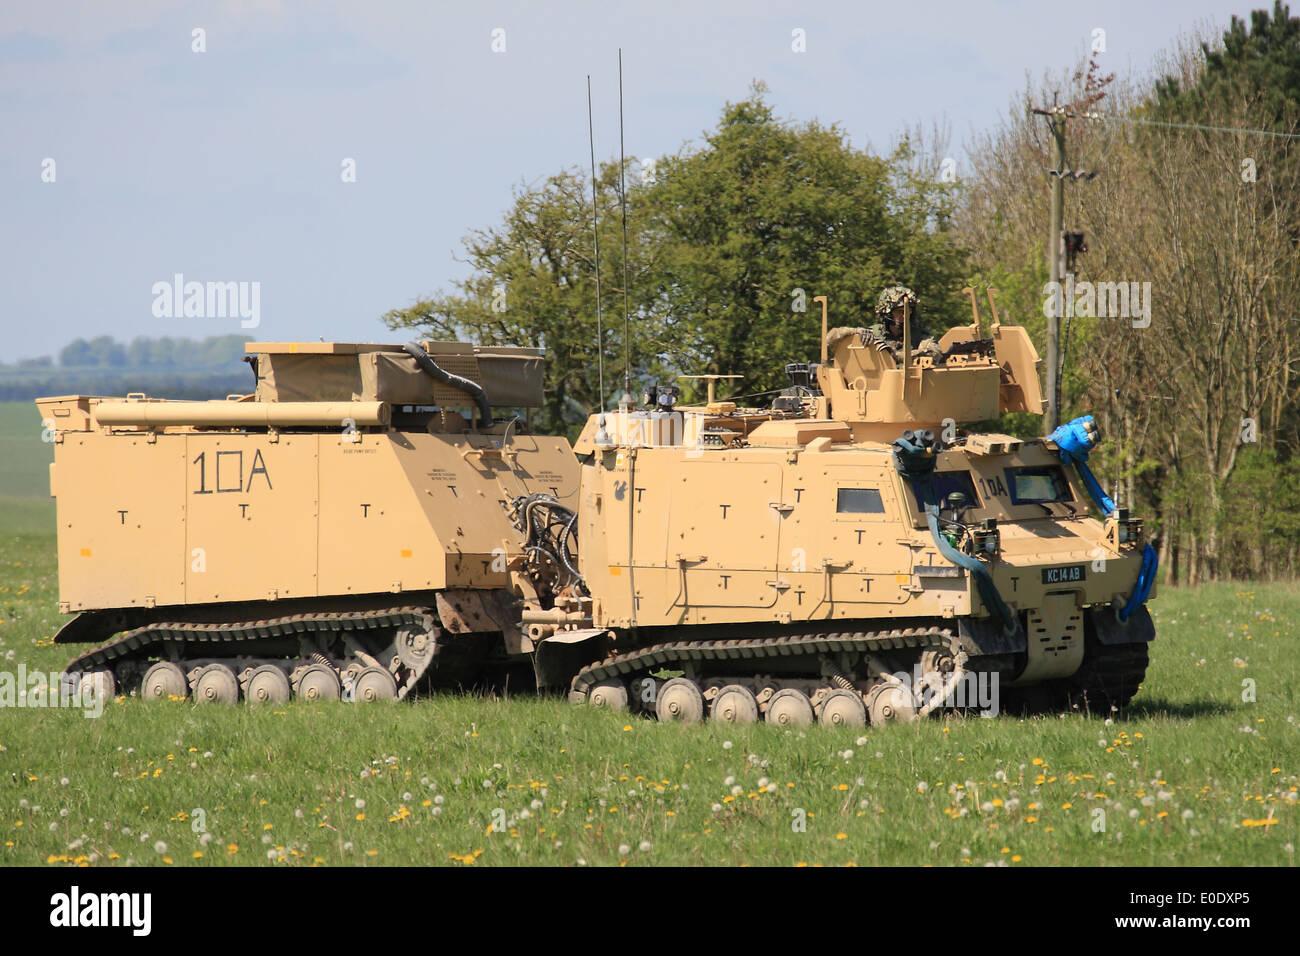 British Army Viking BVS10 Protected All Terrain Vehicle